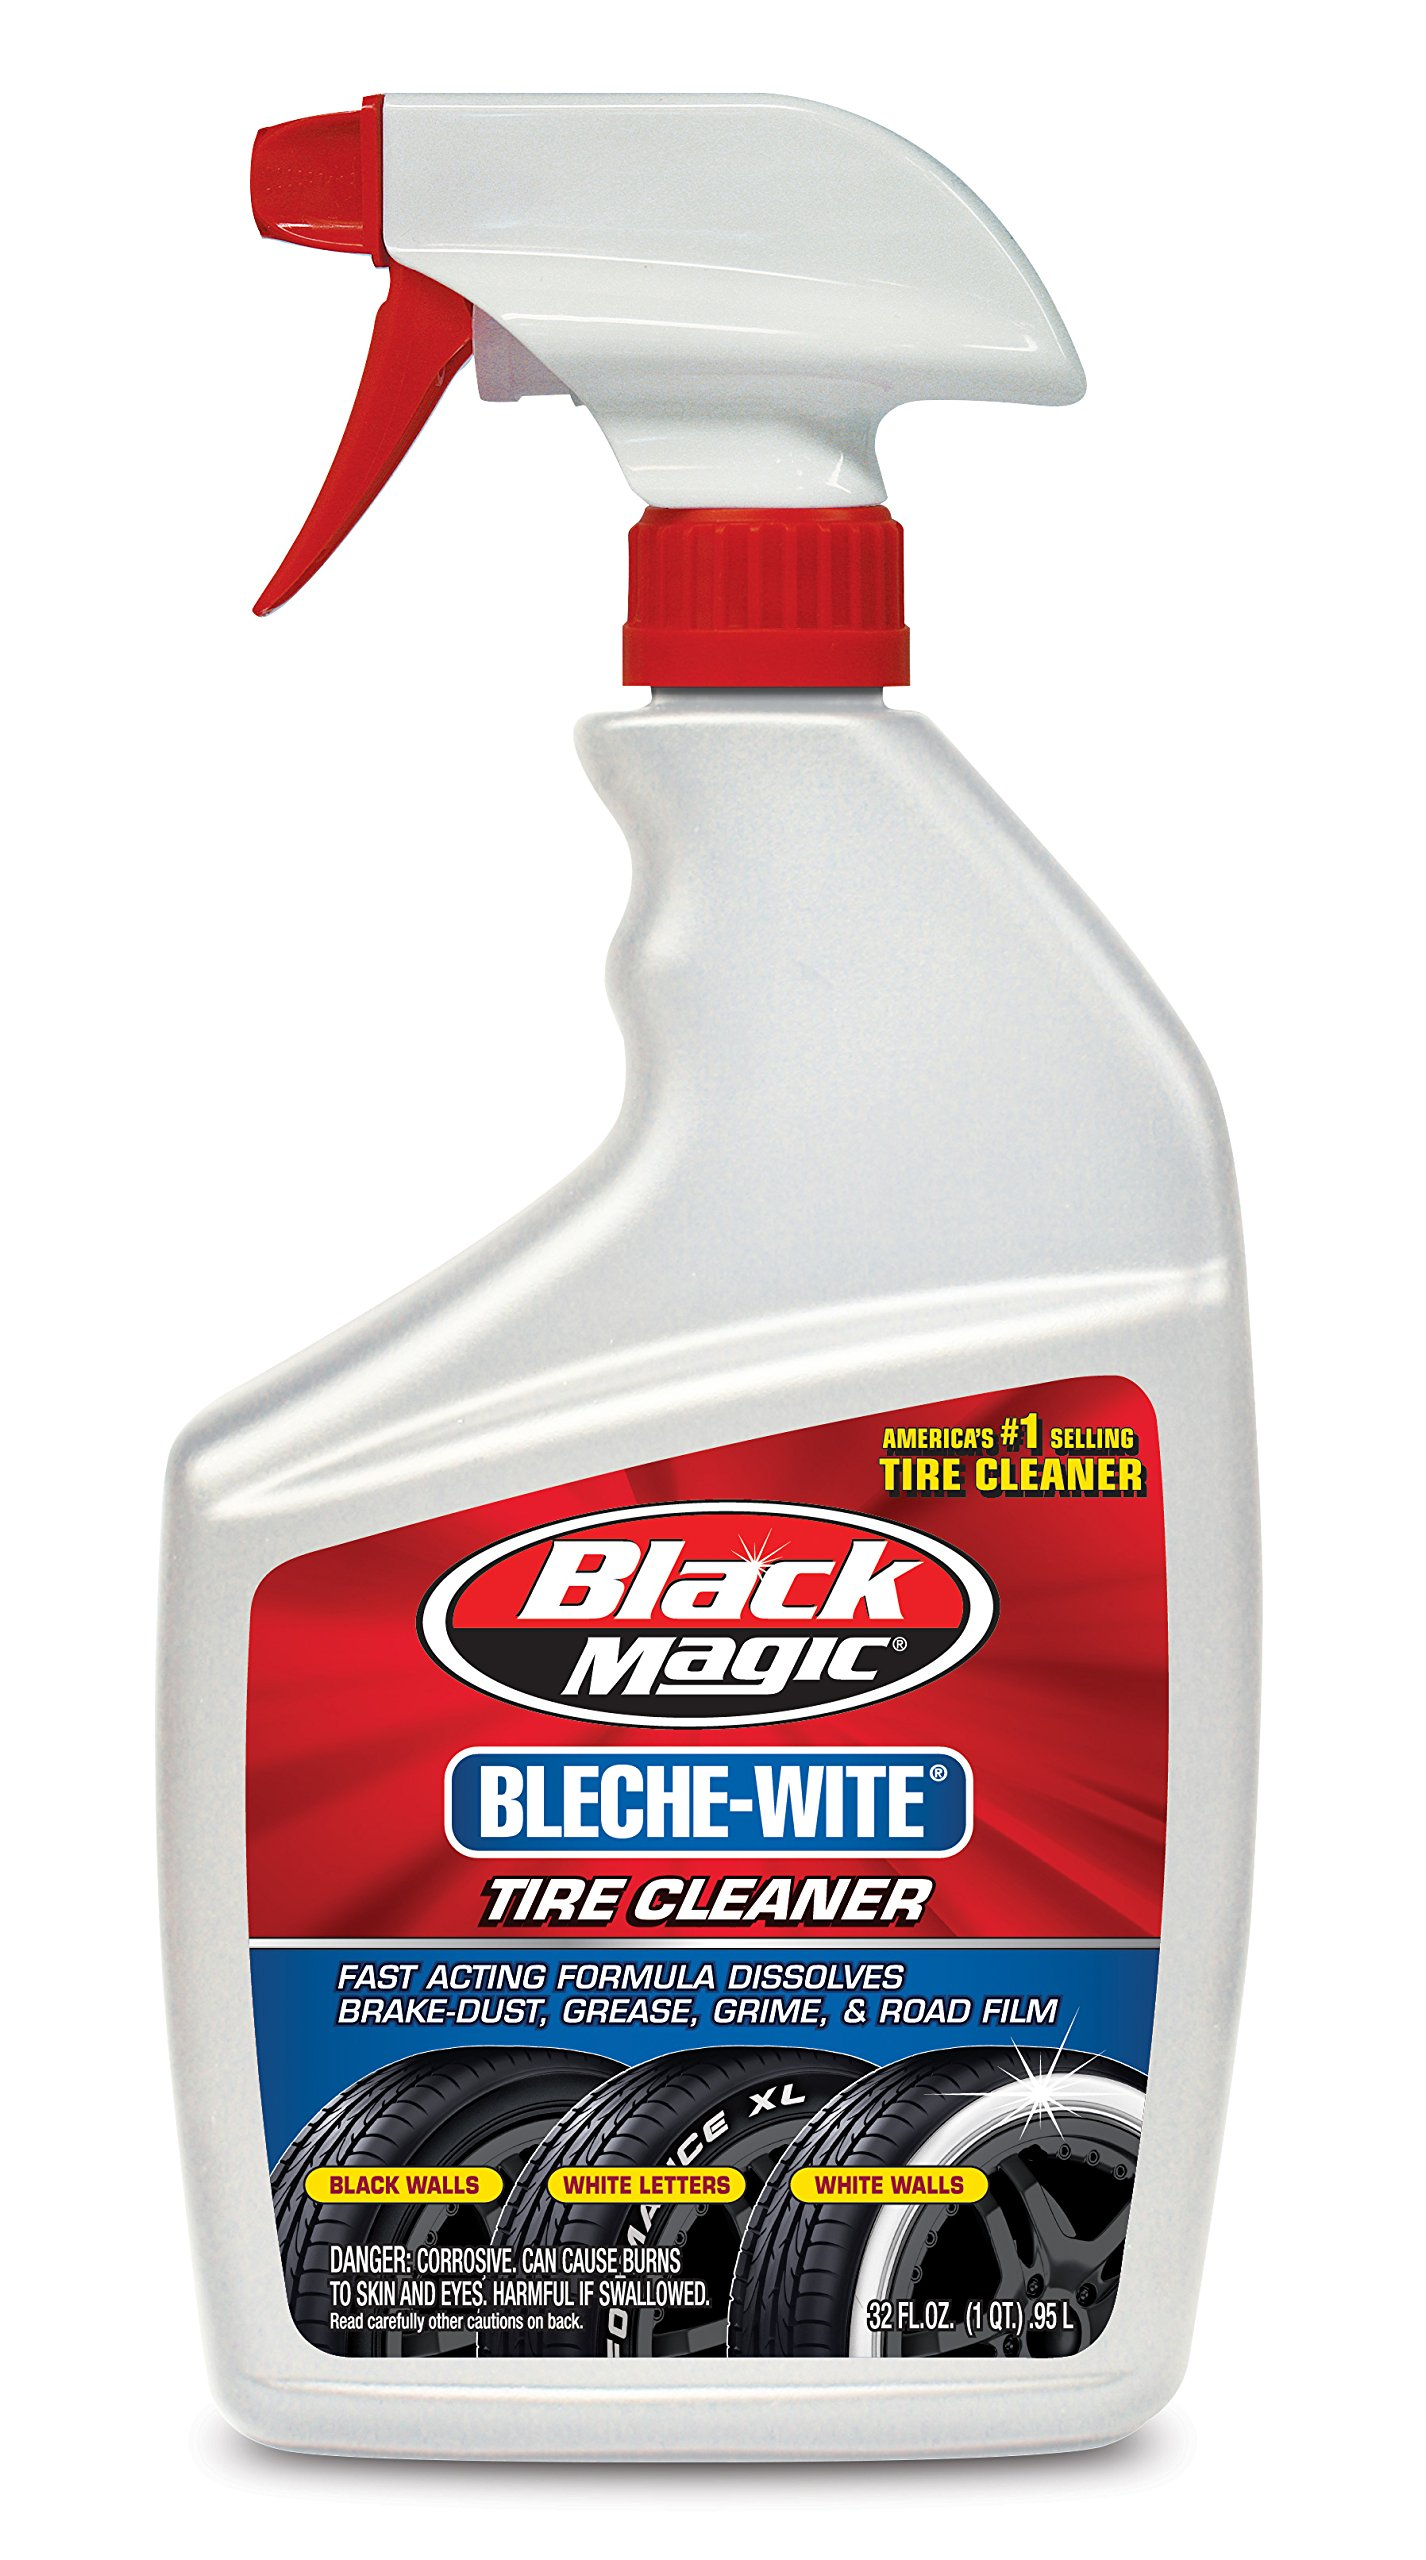 Black-Magic-120066-Bleche-Wite-Tire-Cleaner-32-oz